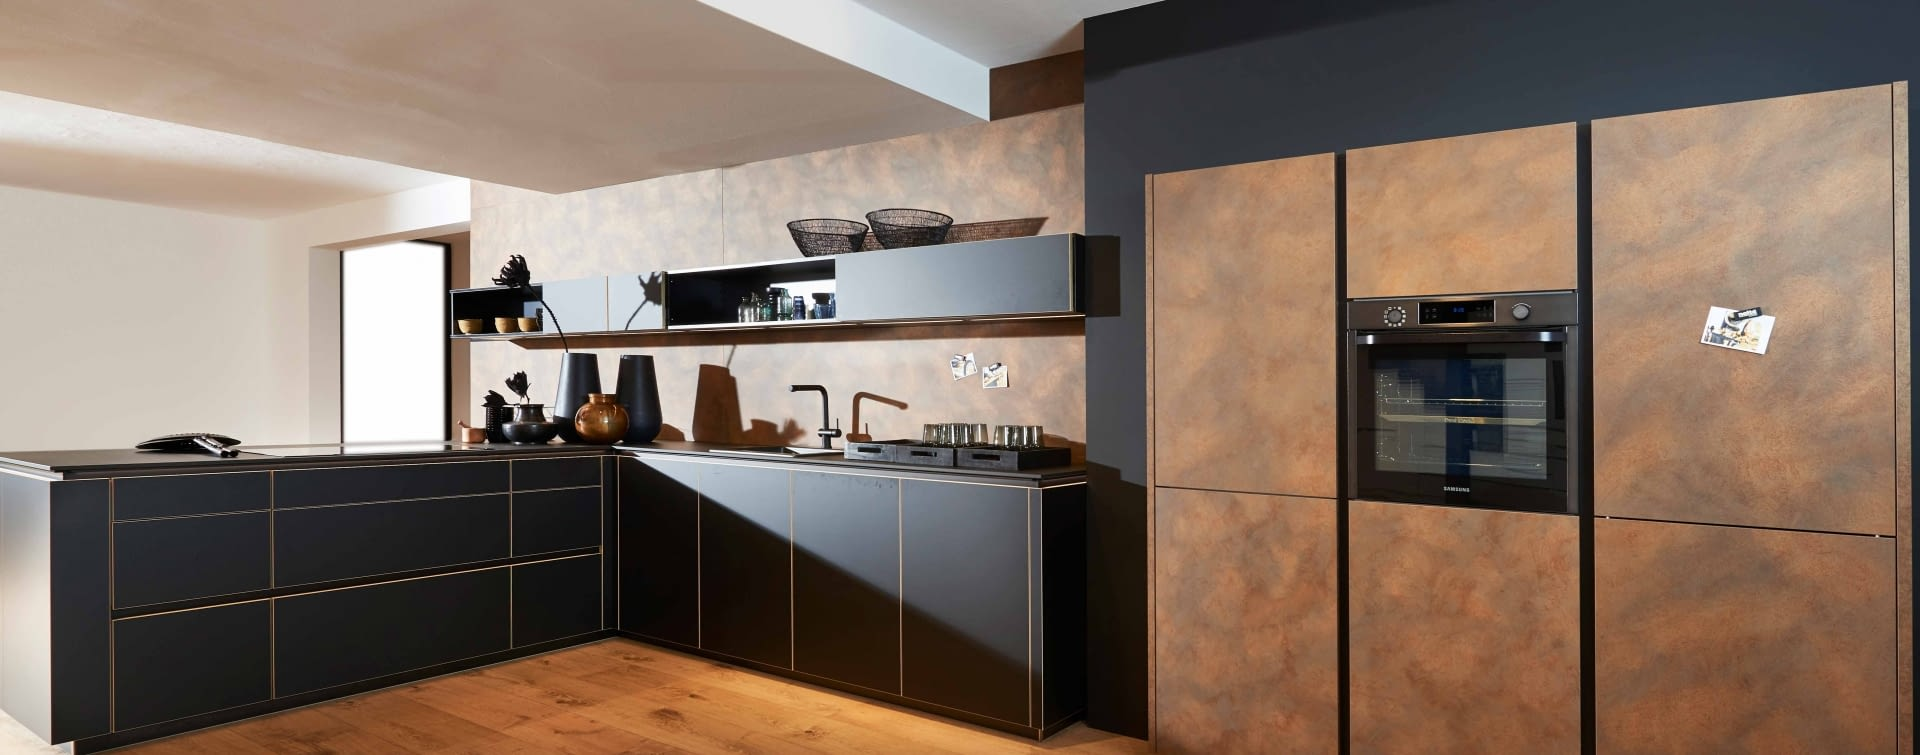 awesome marquardt k chen dresden pictures house design. Black Bedroom Furniture Sets. Home Design Ideas